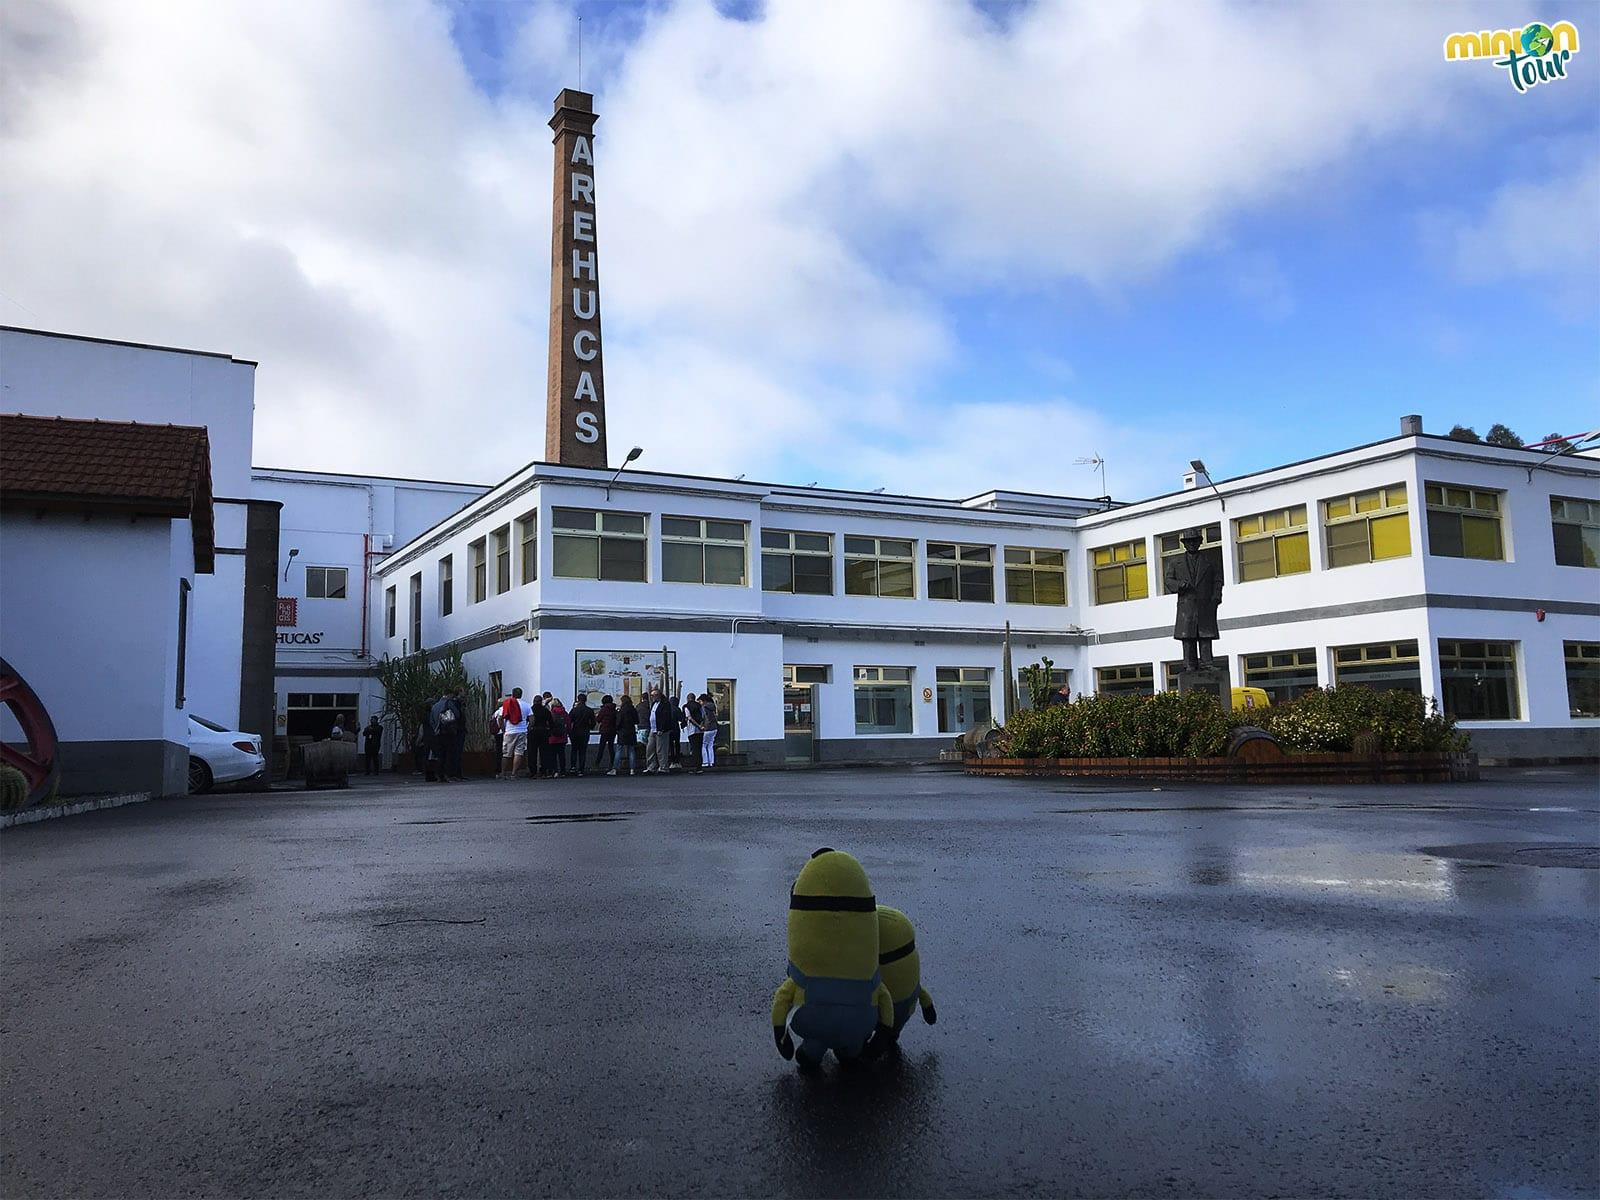 Fábrica de ron Arehucas